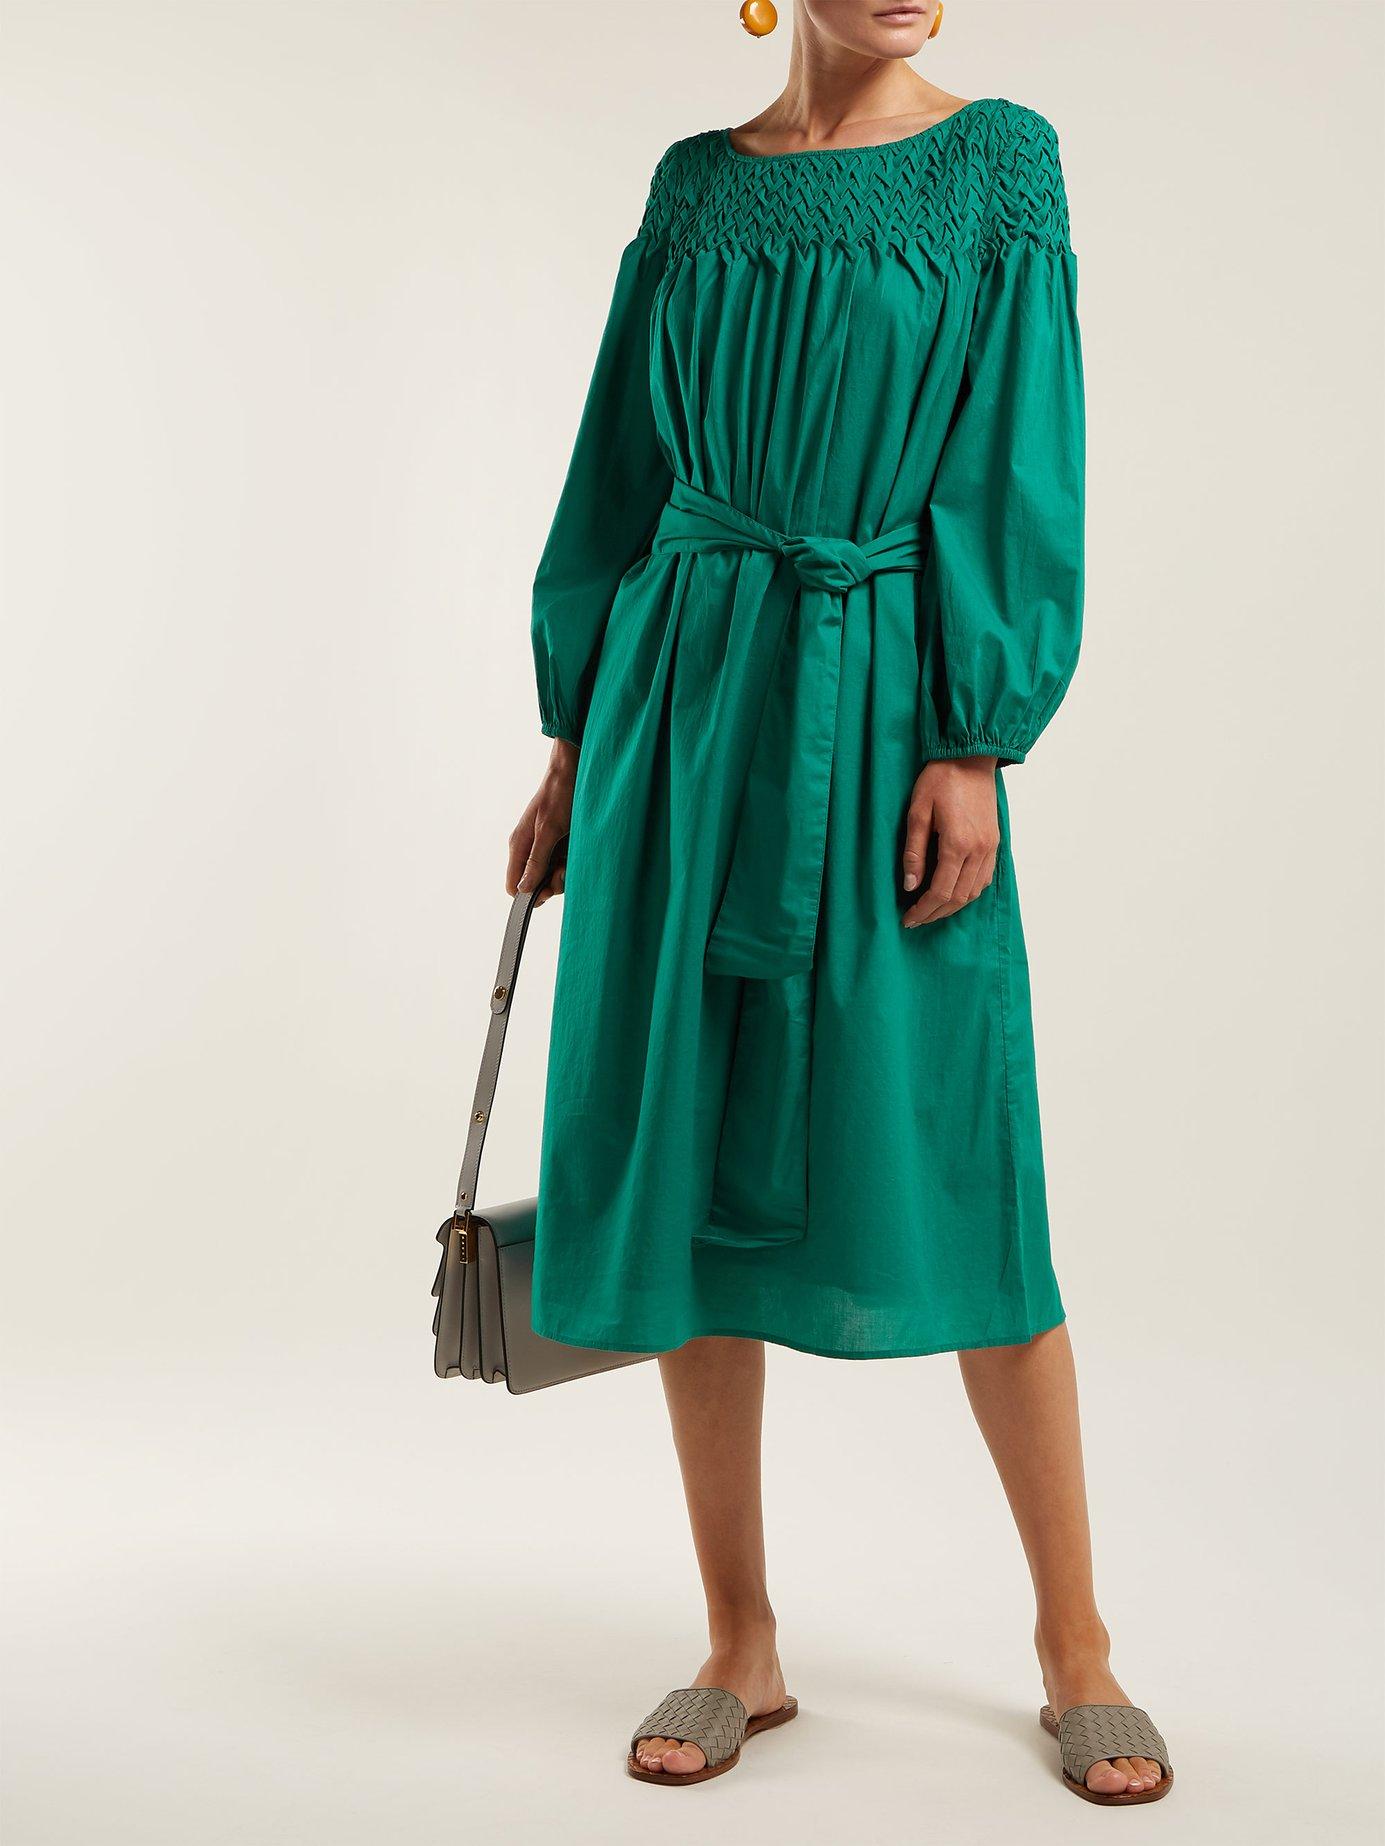 Bonaire belted cotton dress by Merlette